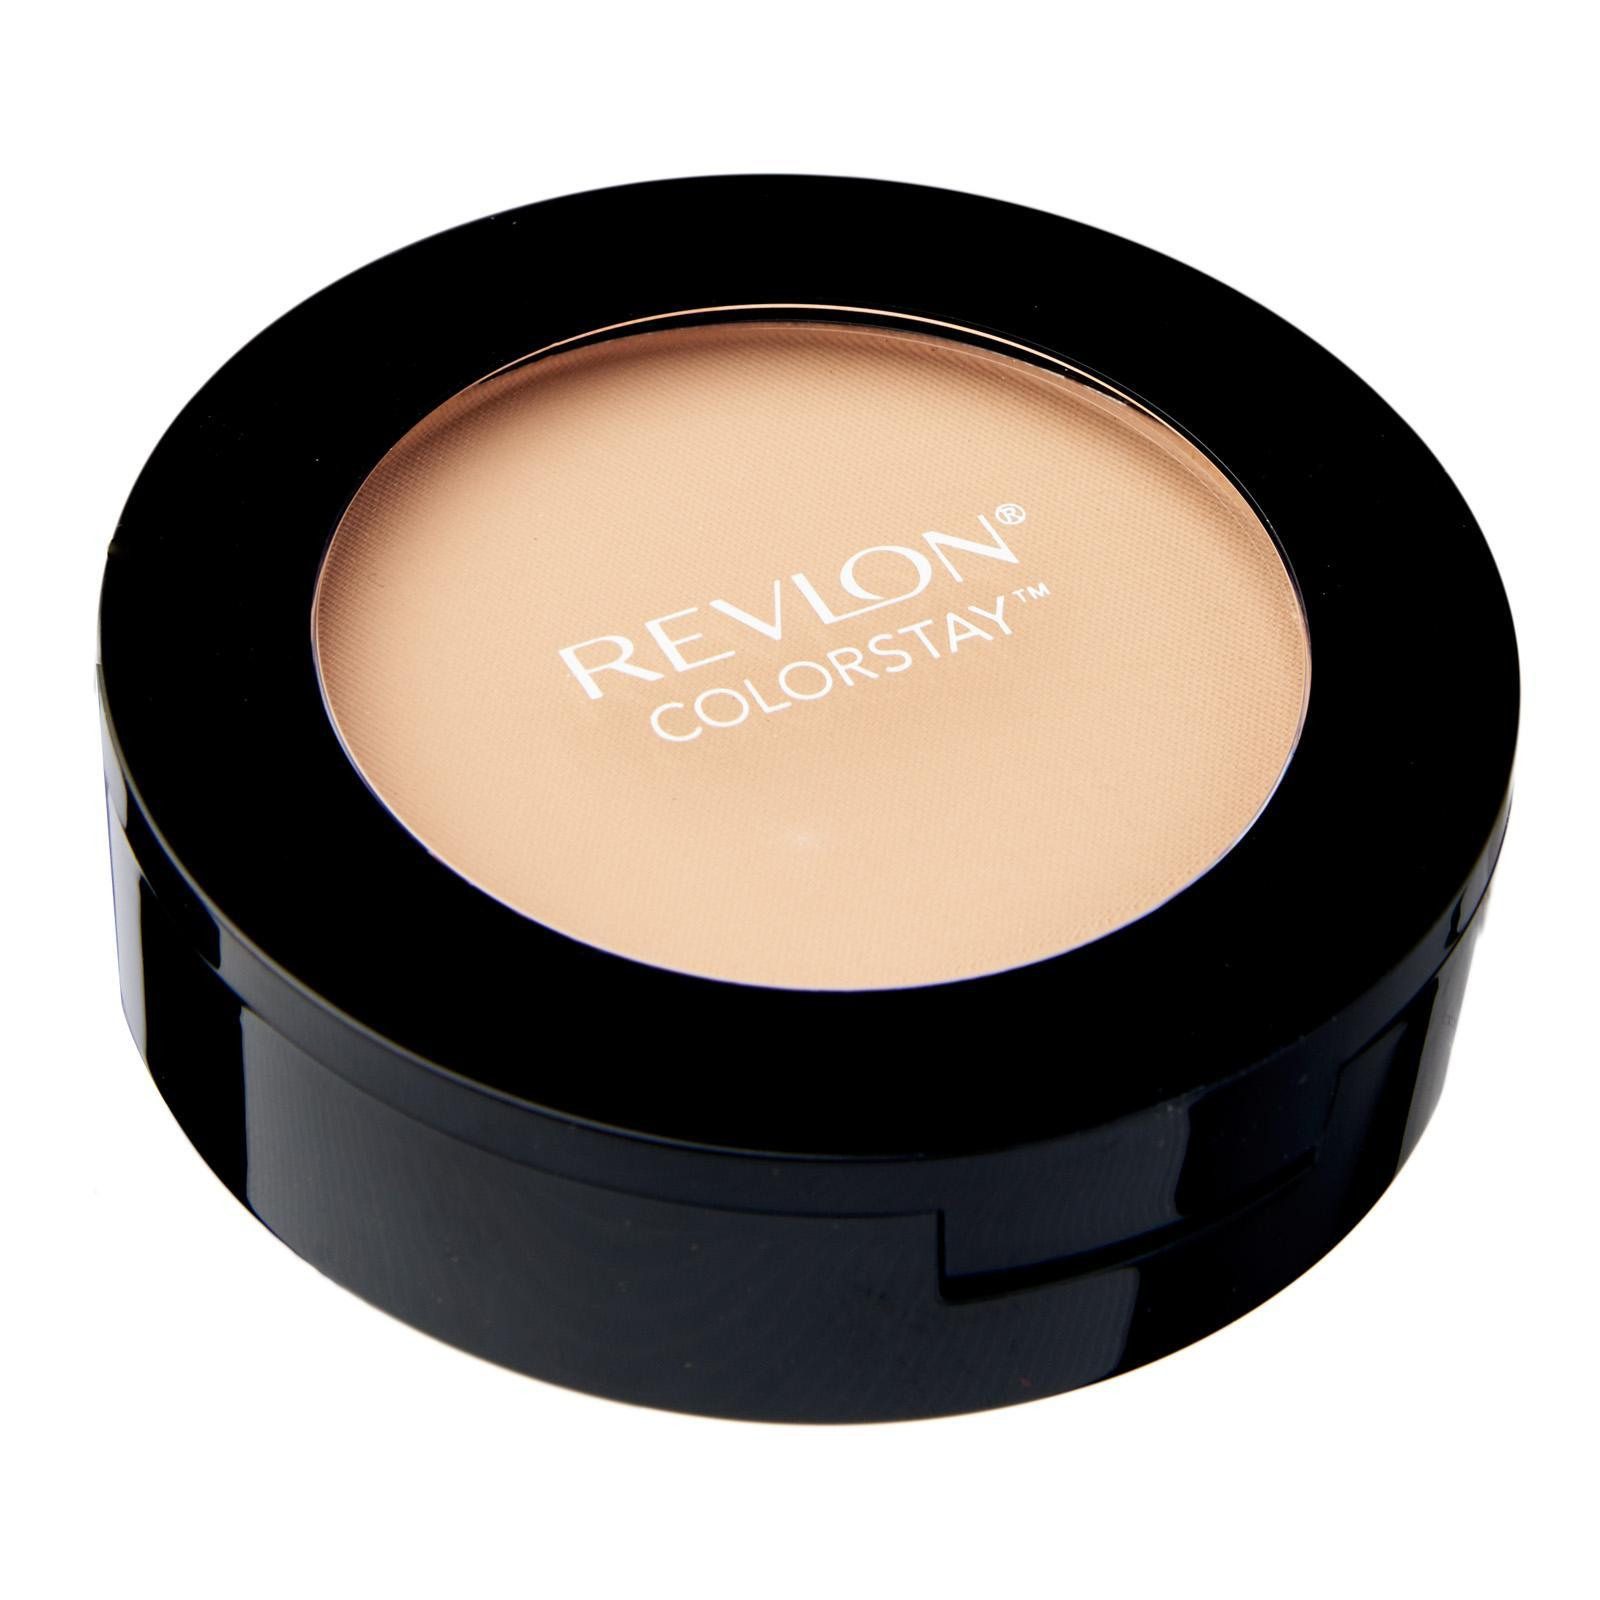 Revlon ColorStay Pressed Powder 830 Light/Medium